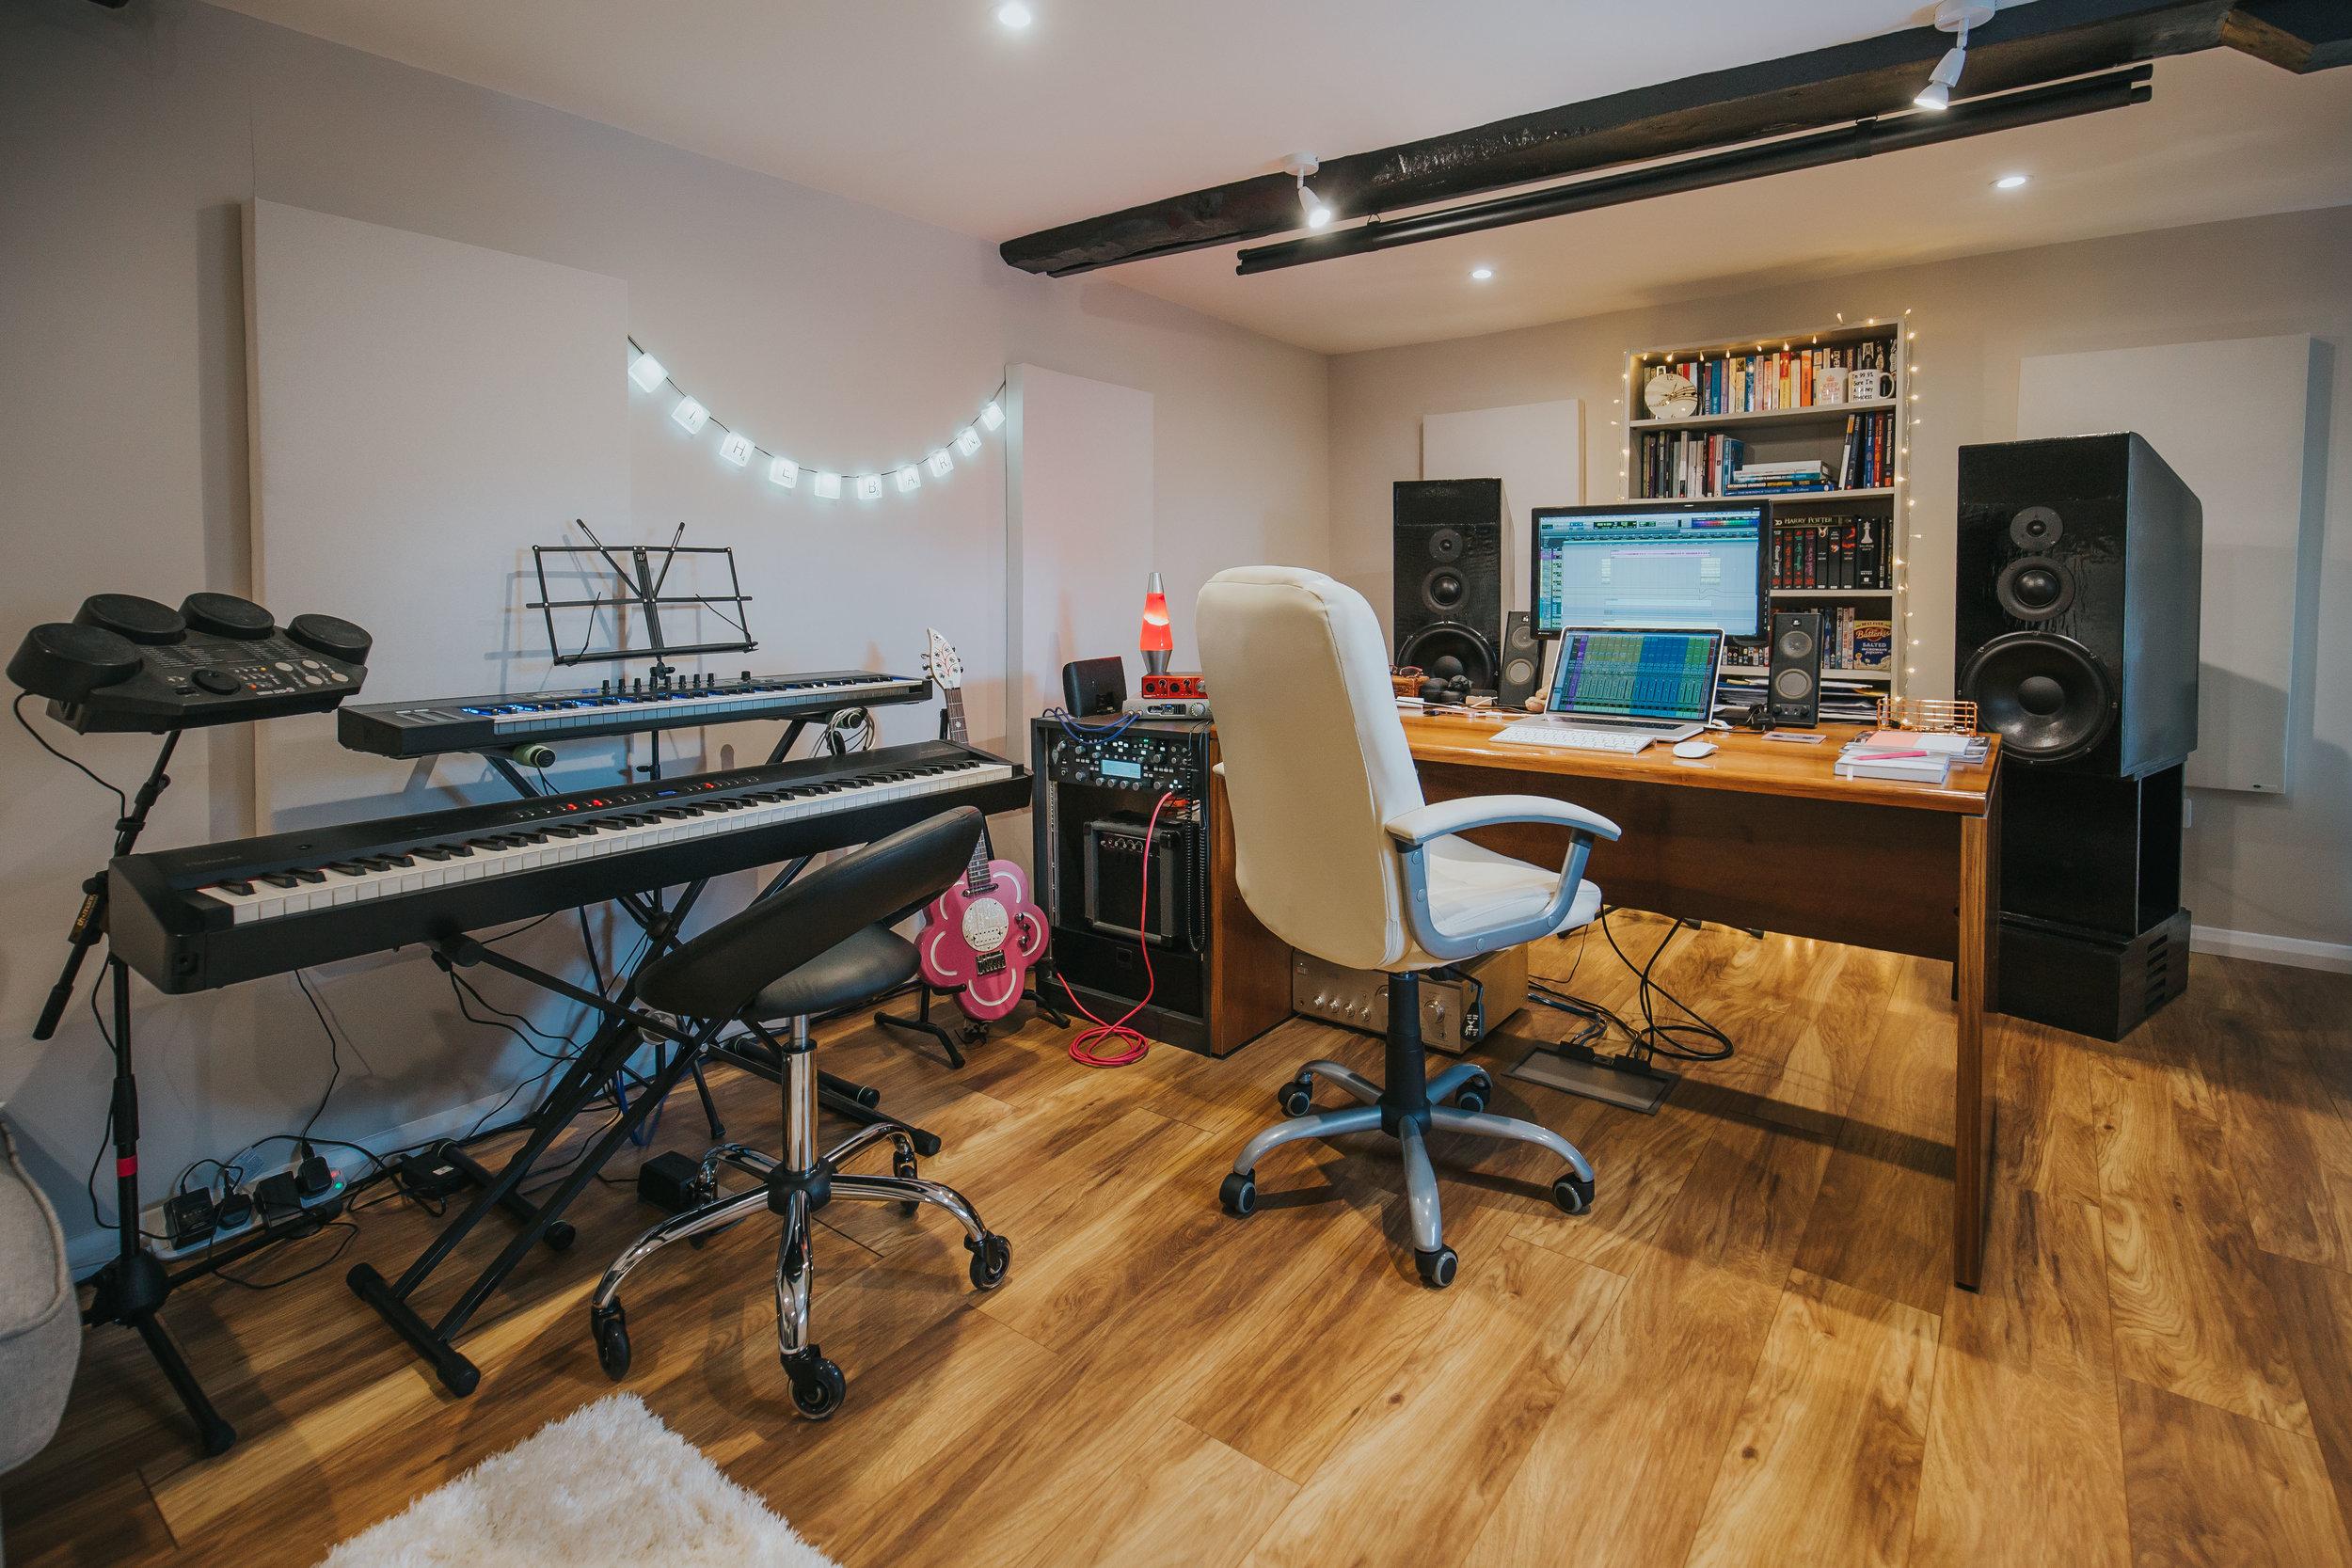 Production Studio | The Barn Studio | Photo by Ian Wallman